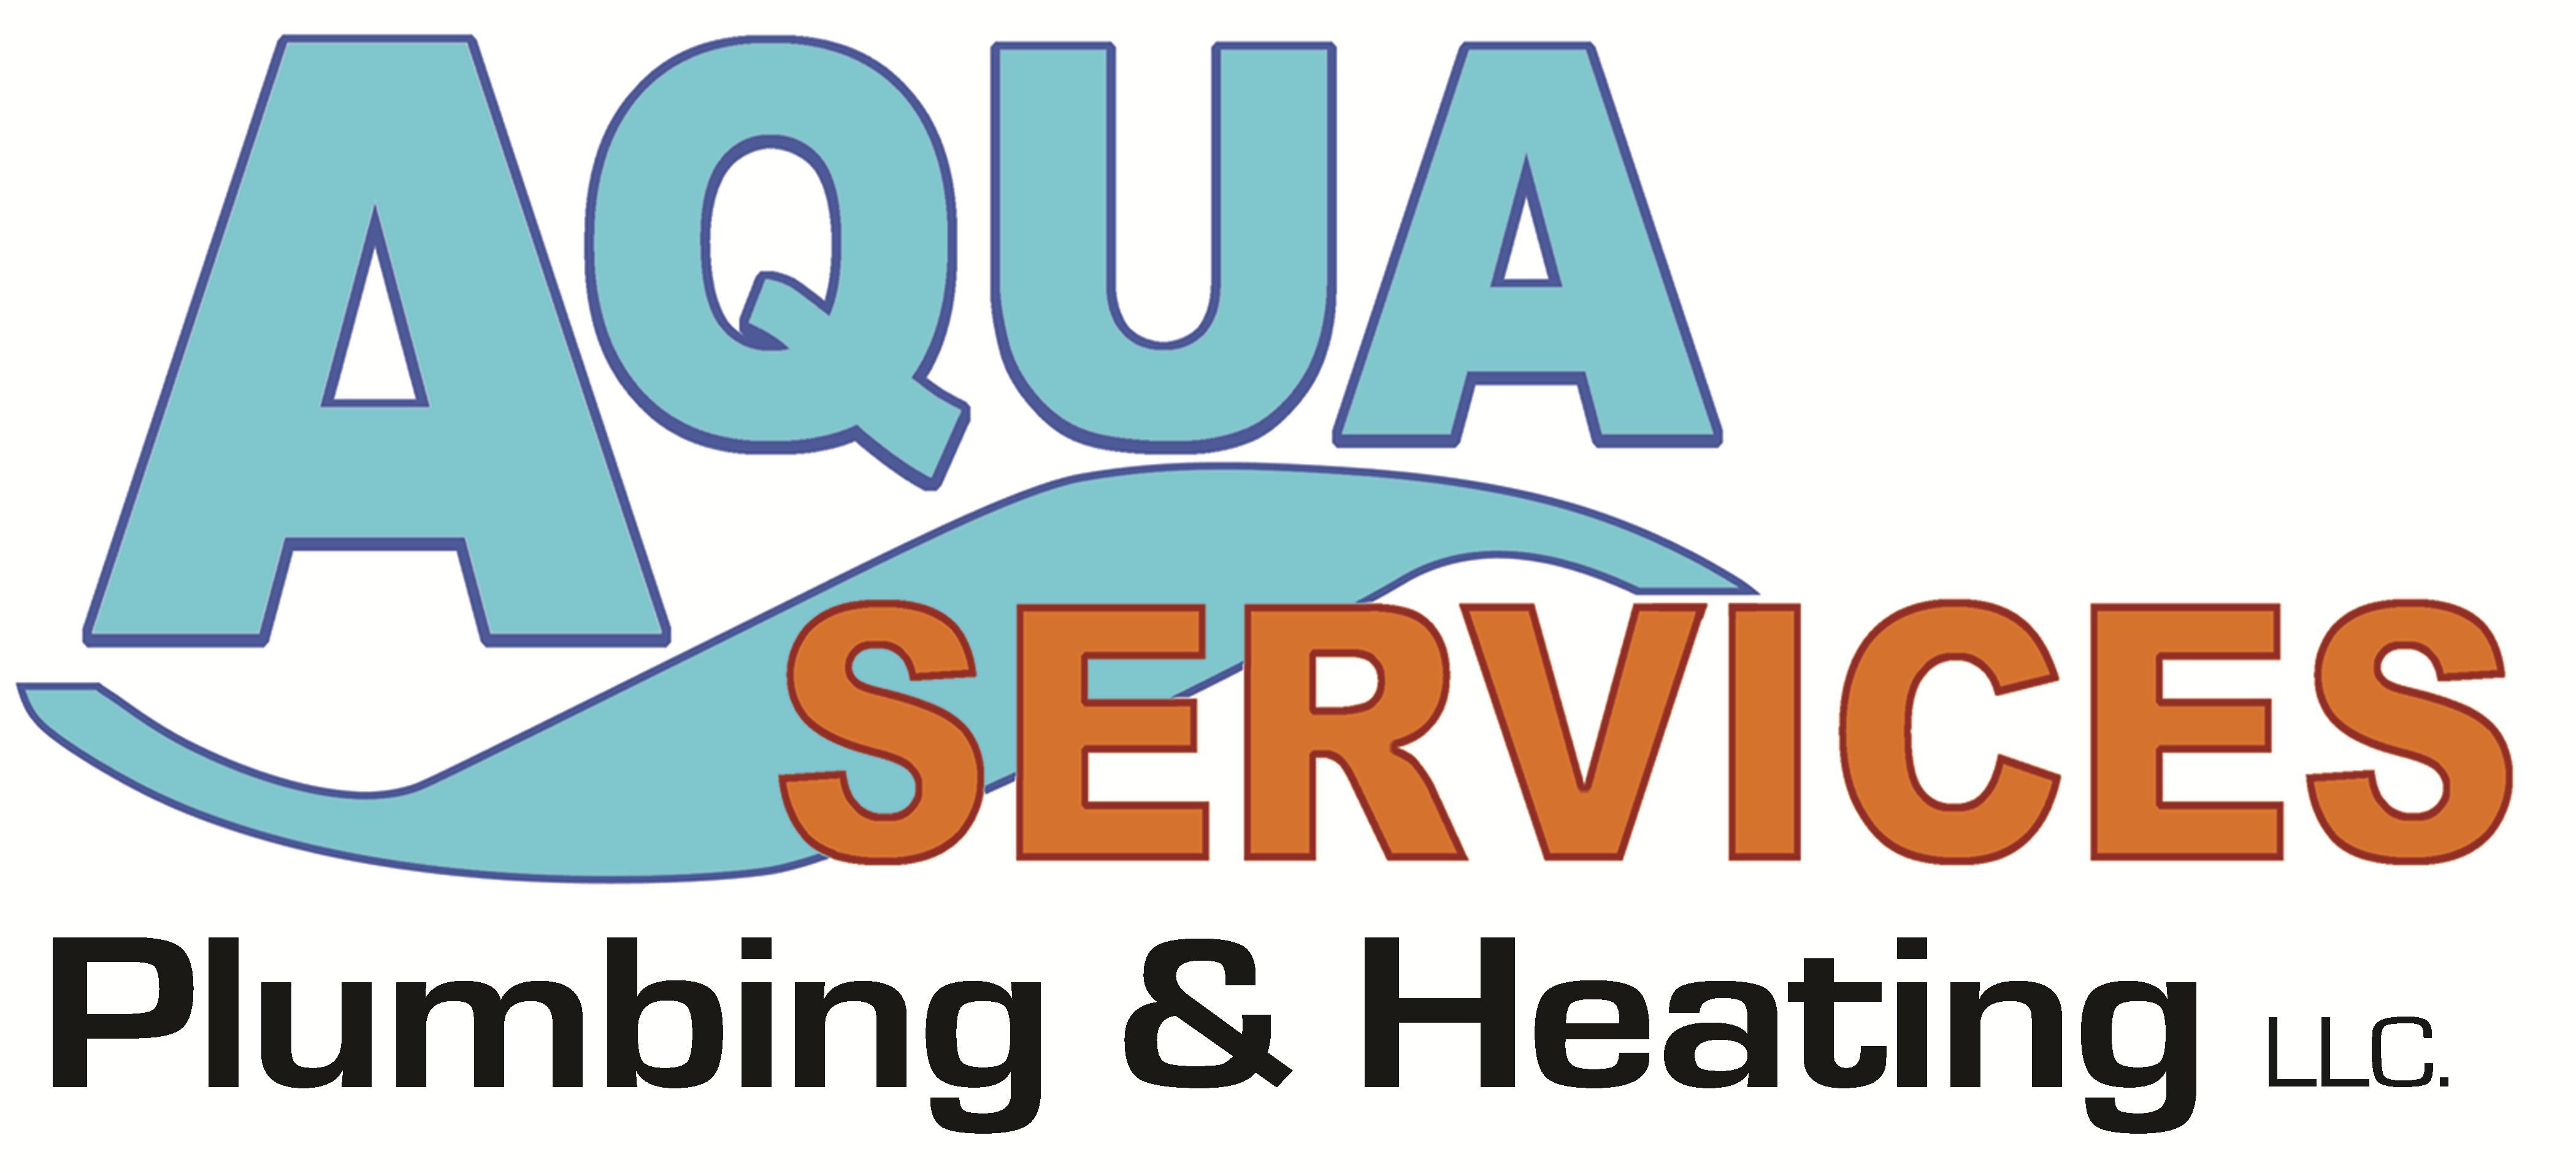 Aqua Services Plumbing & Heating logo